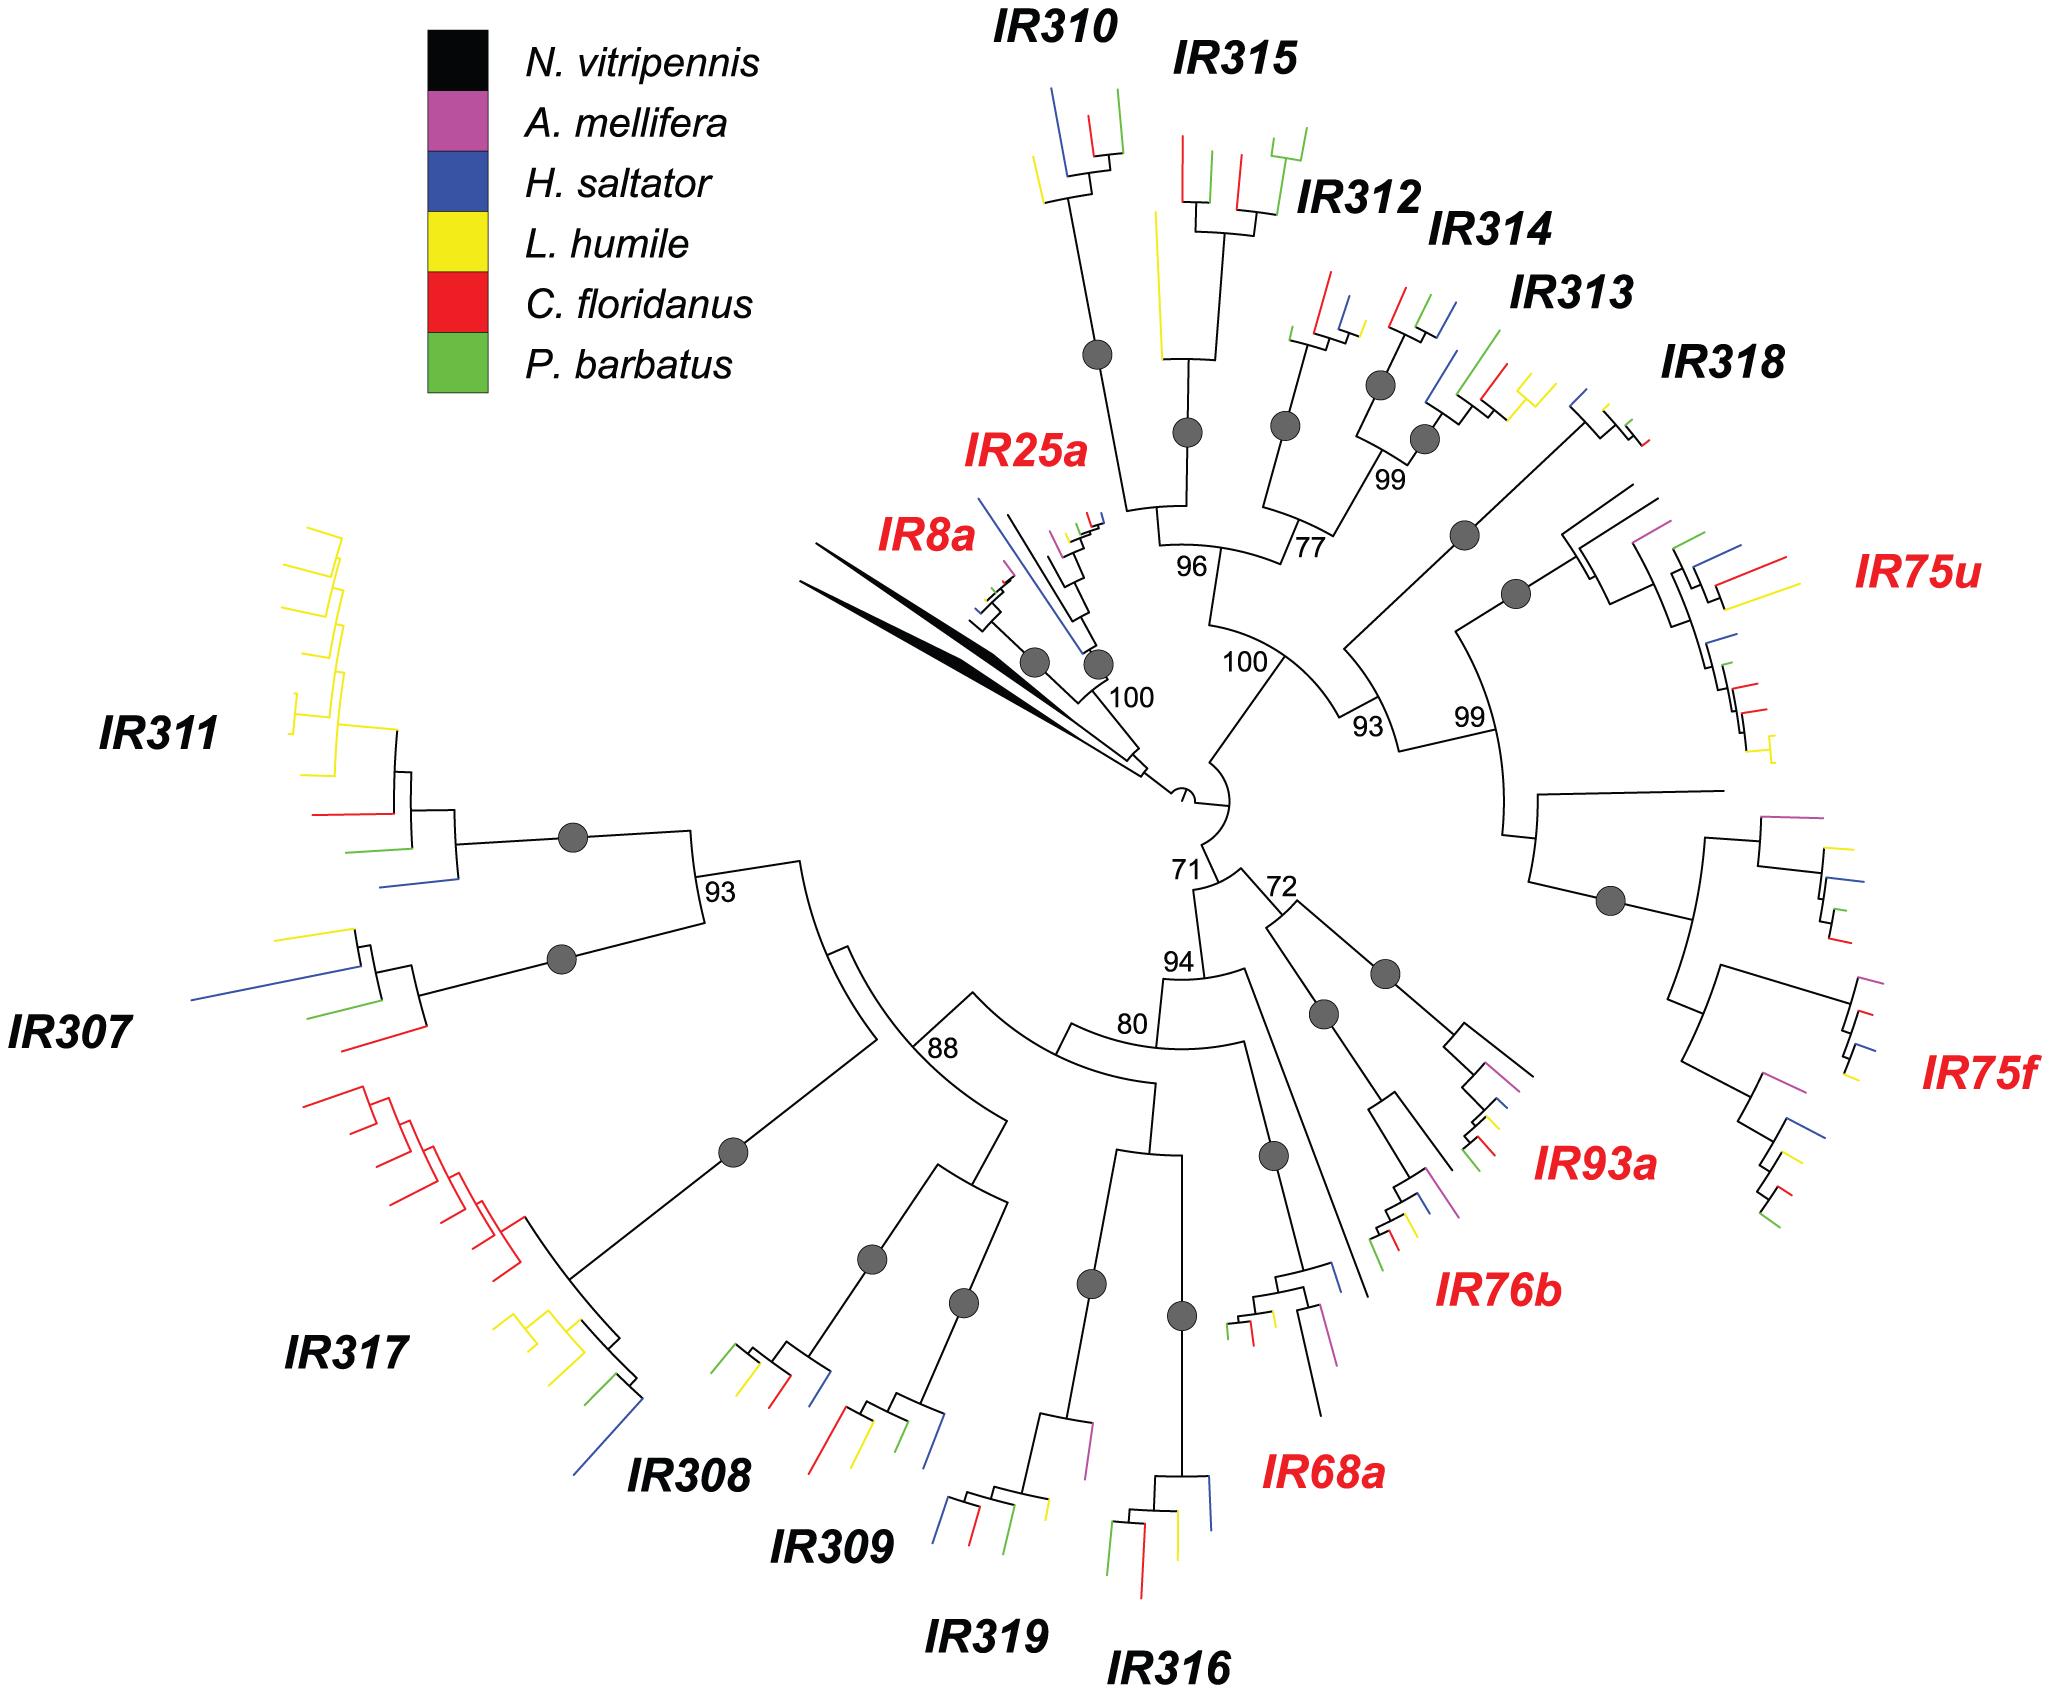 Phylogenetic relationships of Hymenoptera <i>Ir</i> genes.